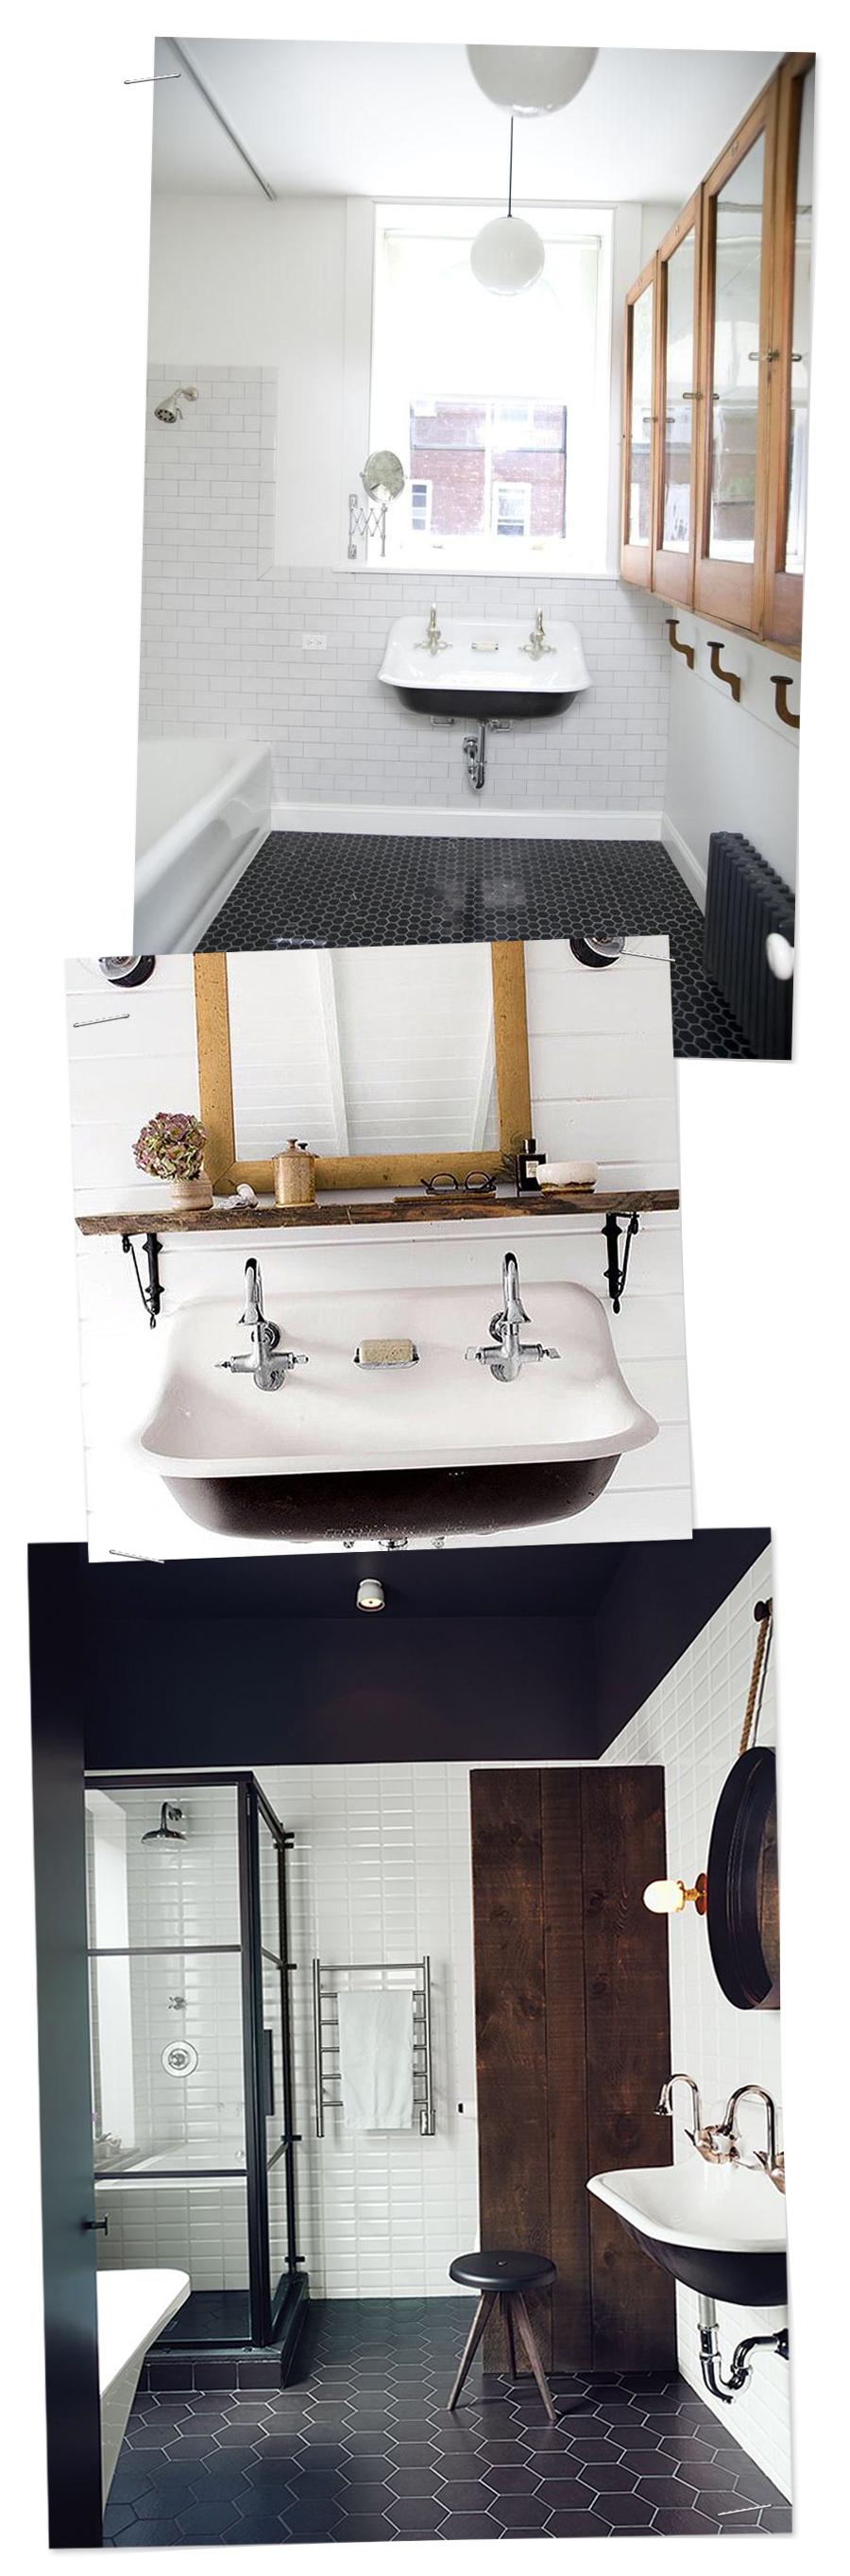 Inspirational Bathrooms : Brockway sink for a bit of vintage